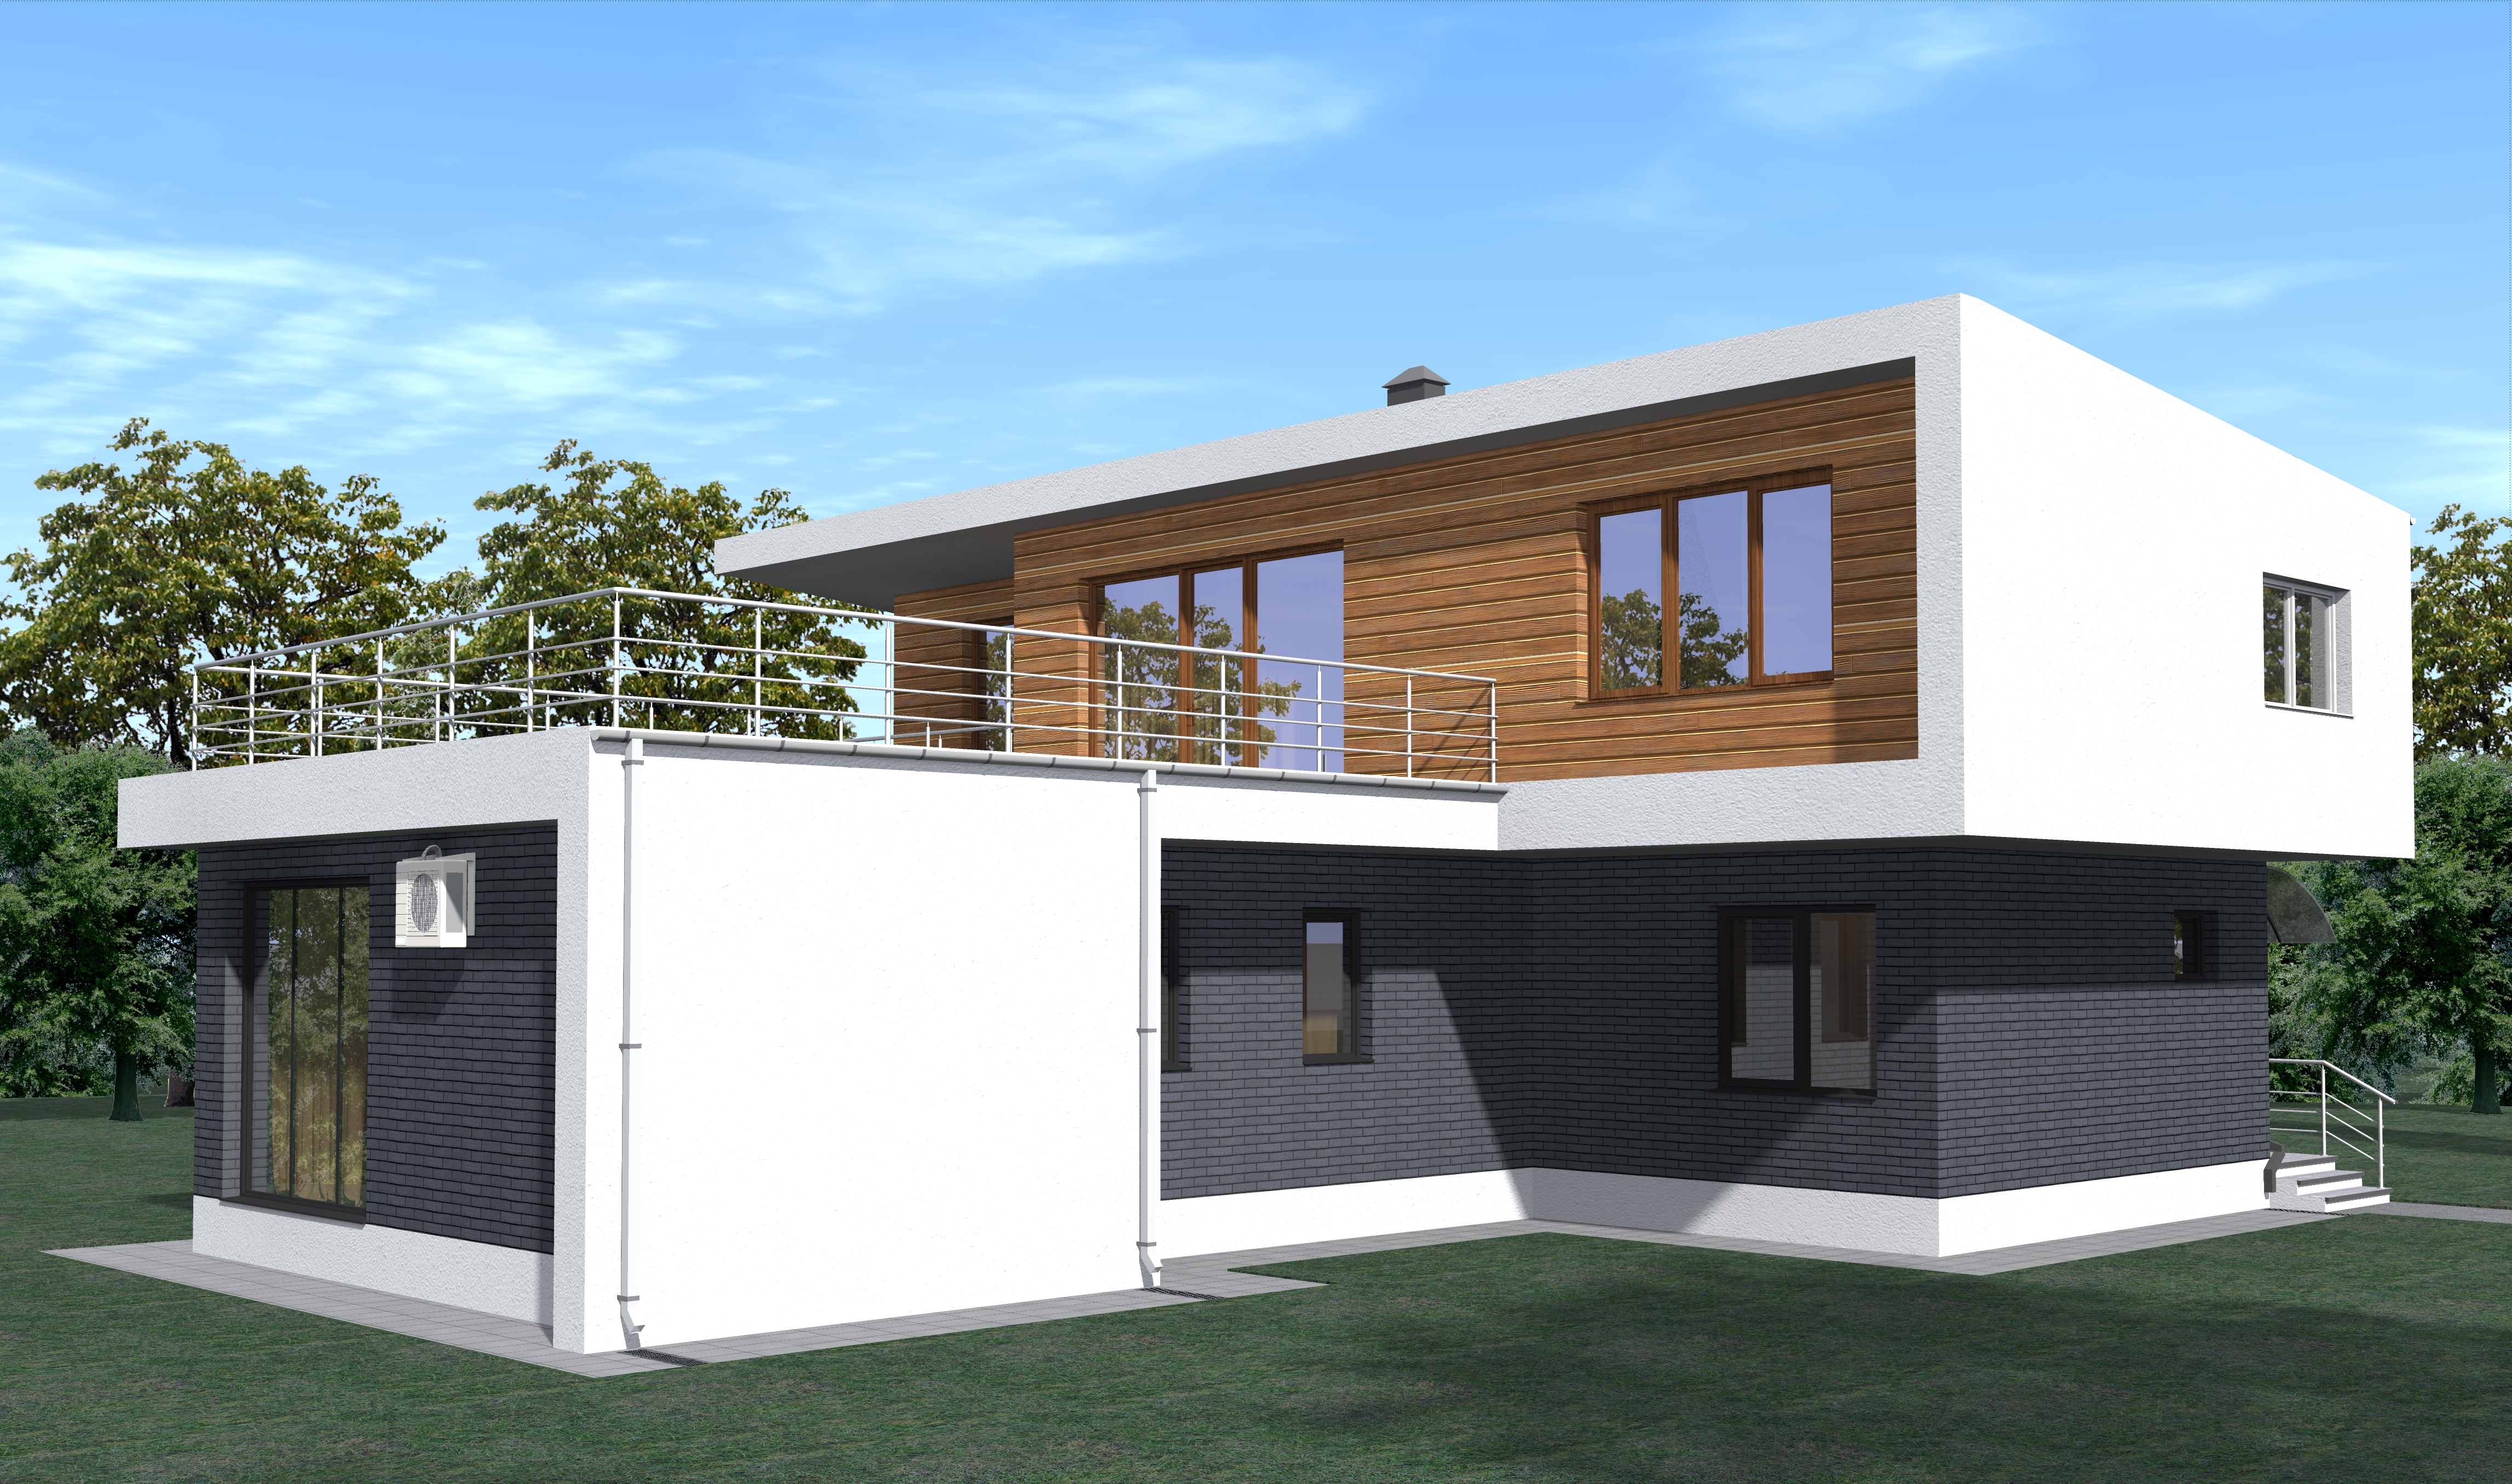 Проект 11.17 фасад